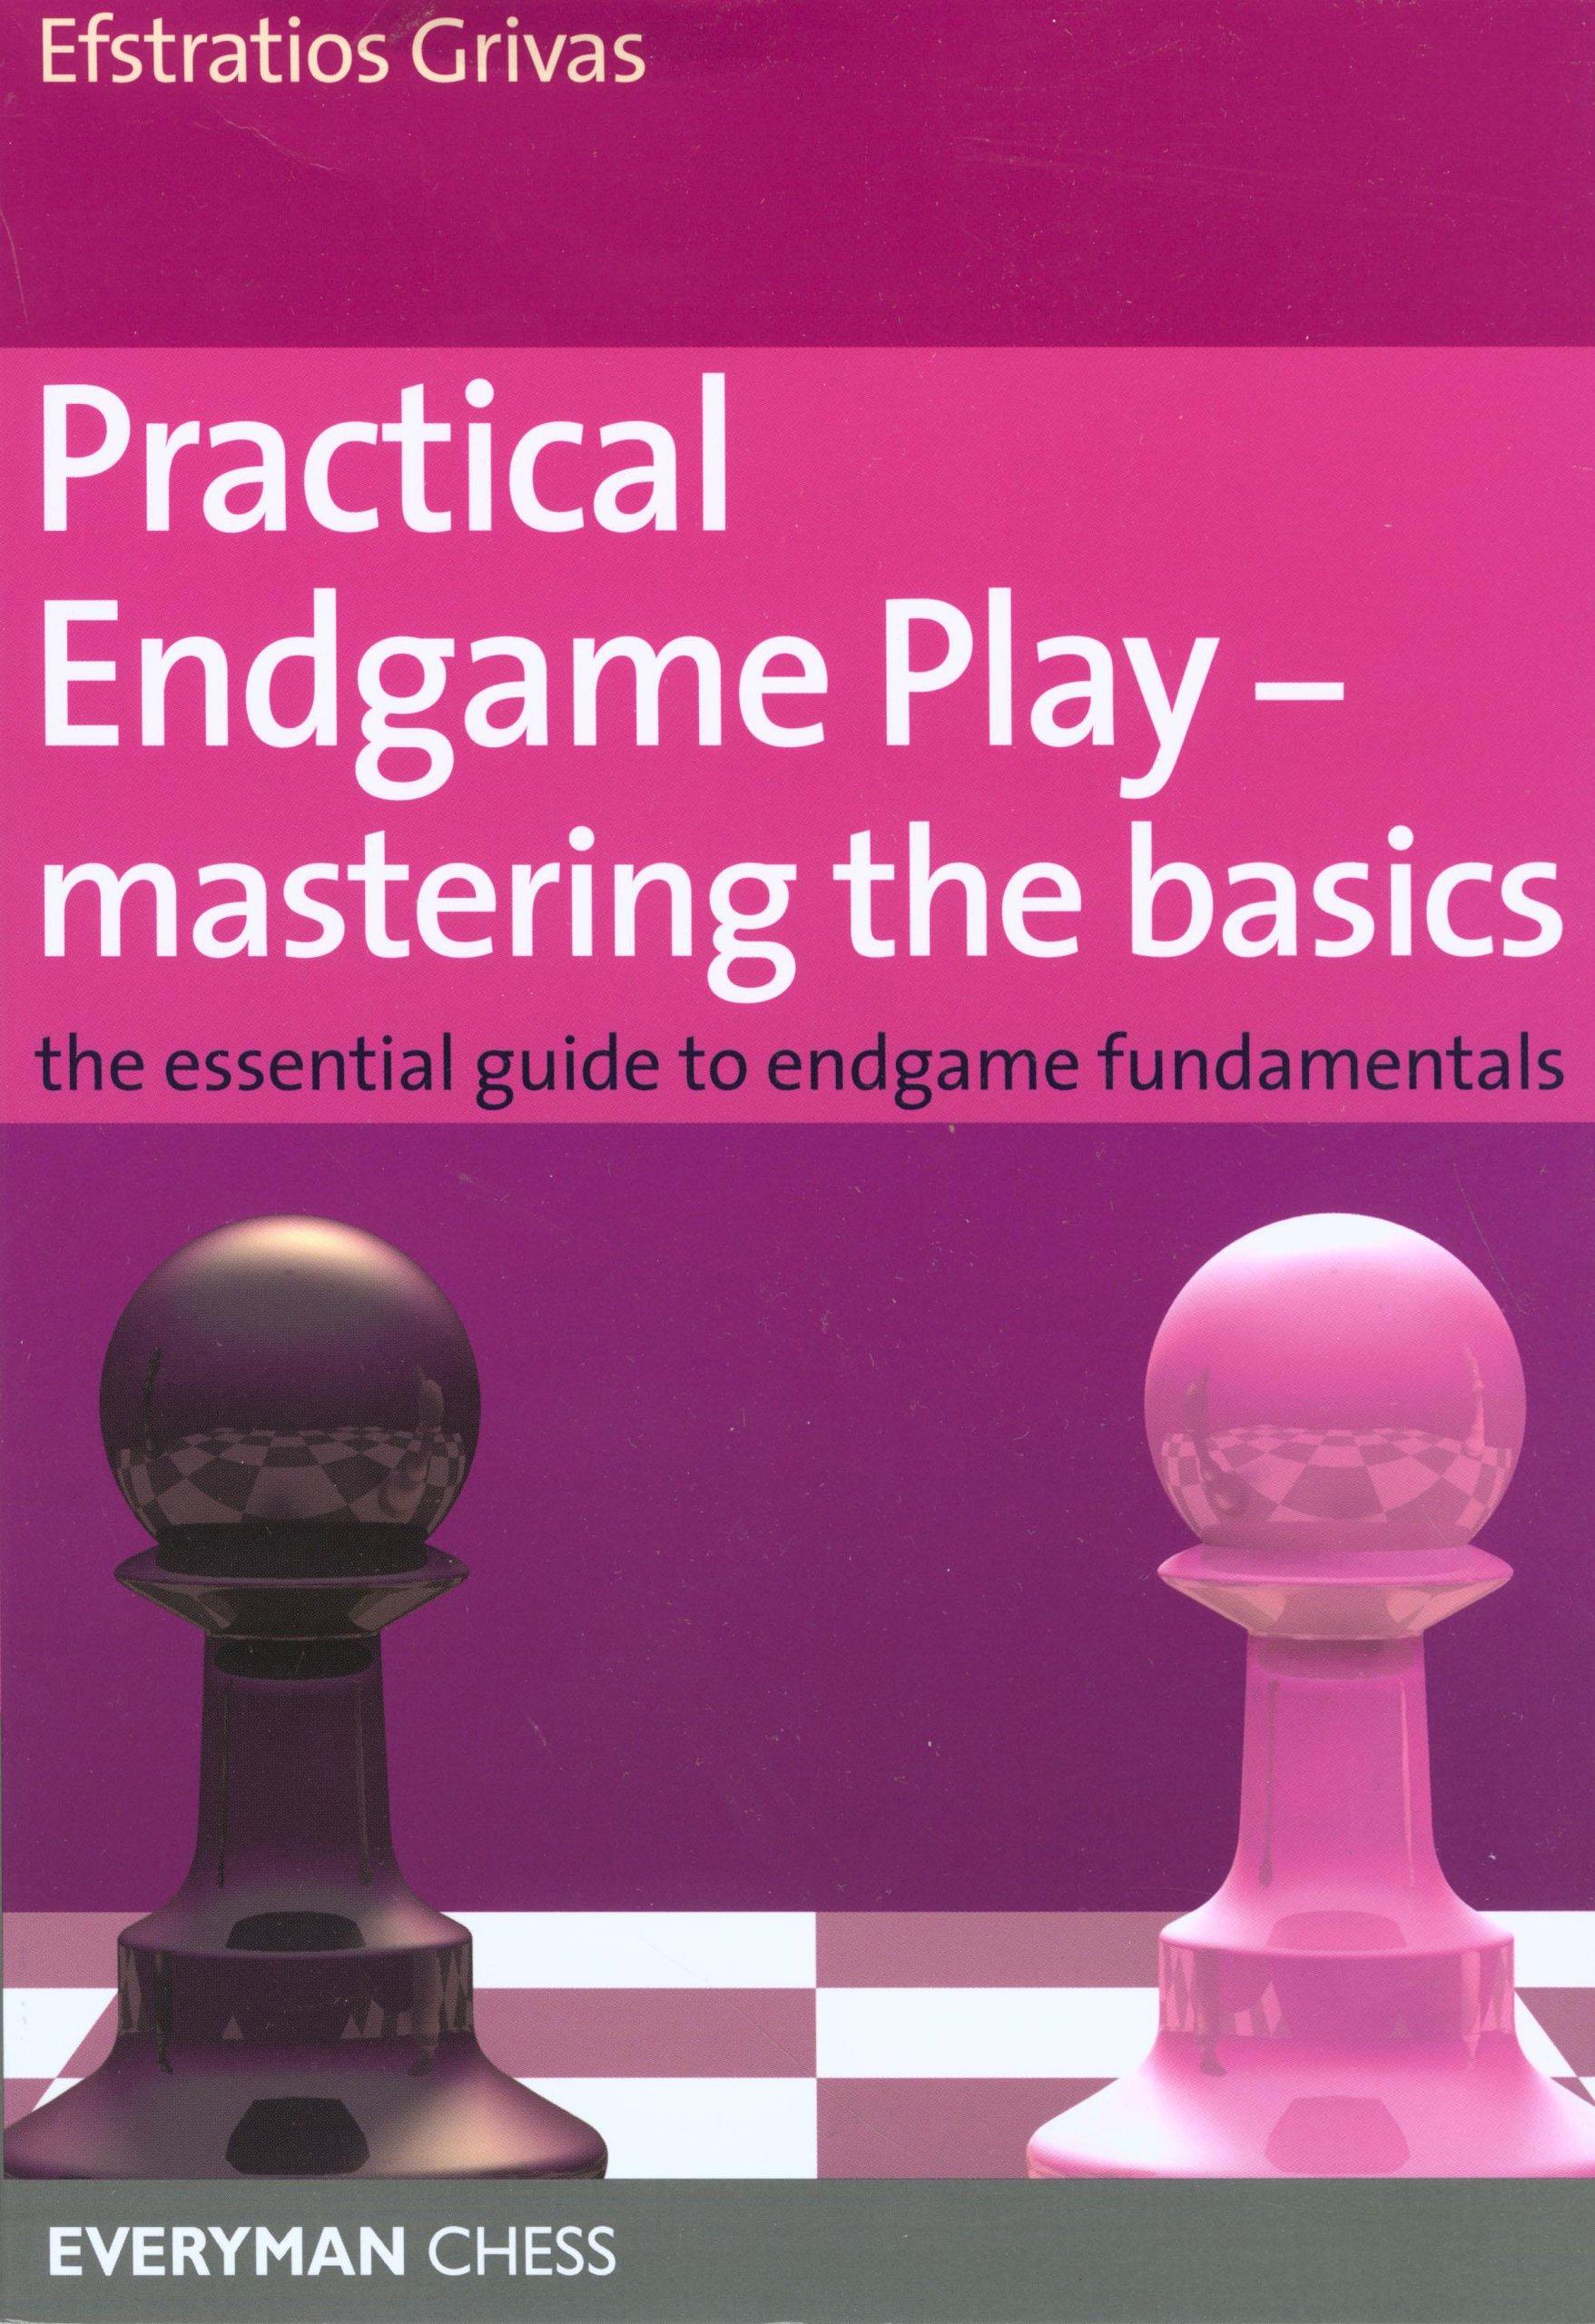 Practical Endgame Play by Efstratios Grivas 91lRsWiczWL